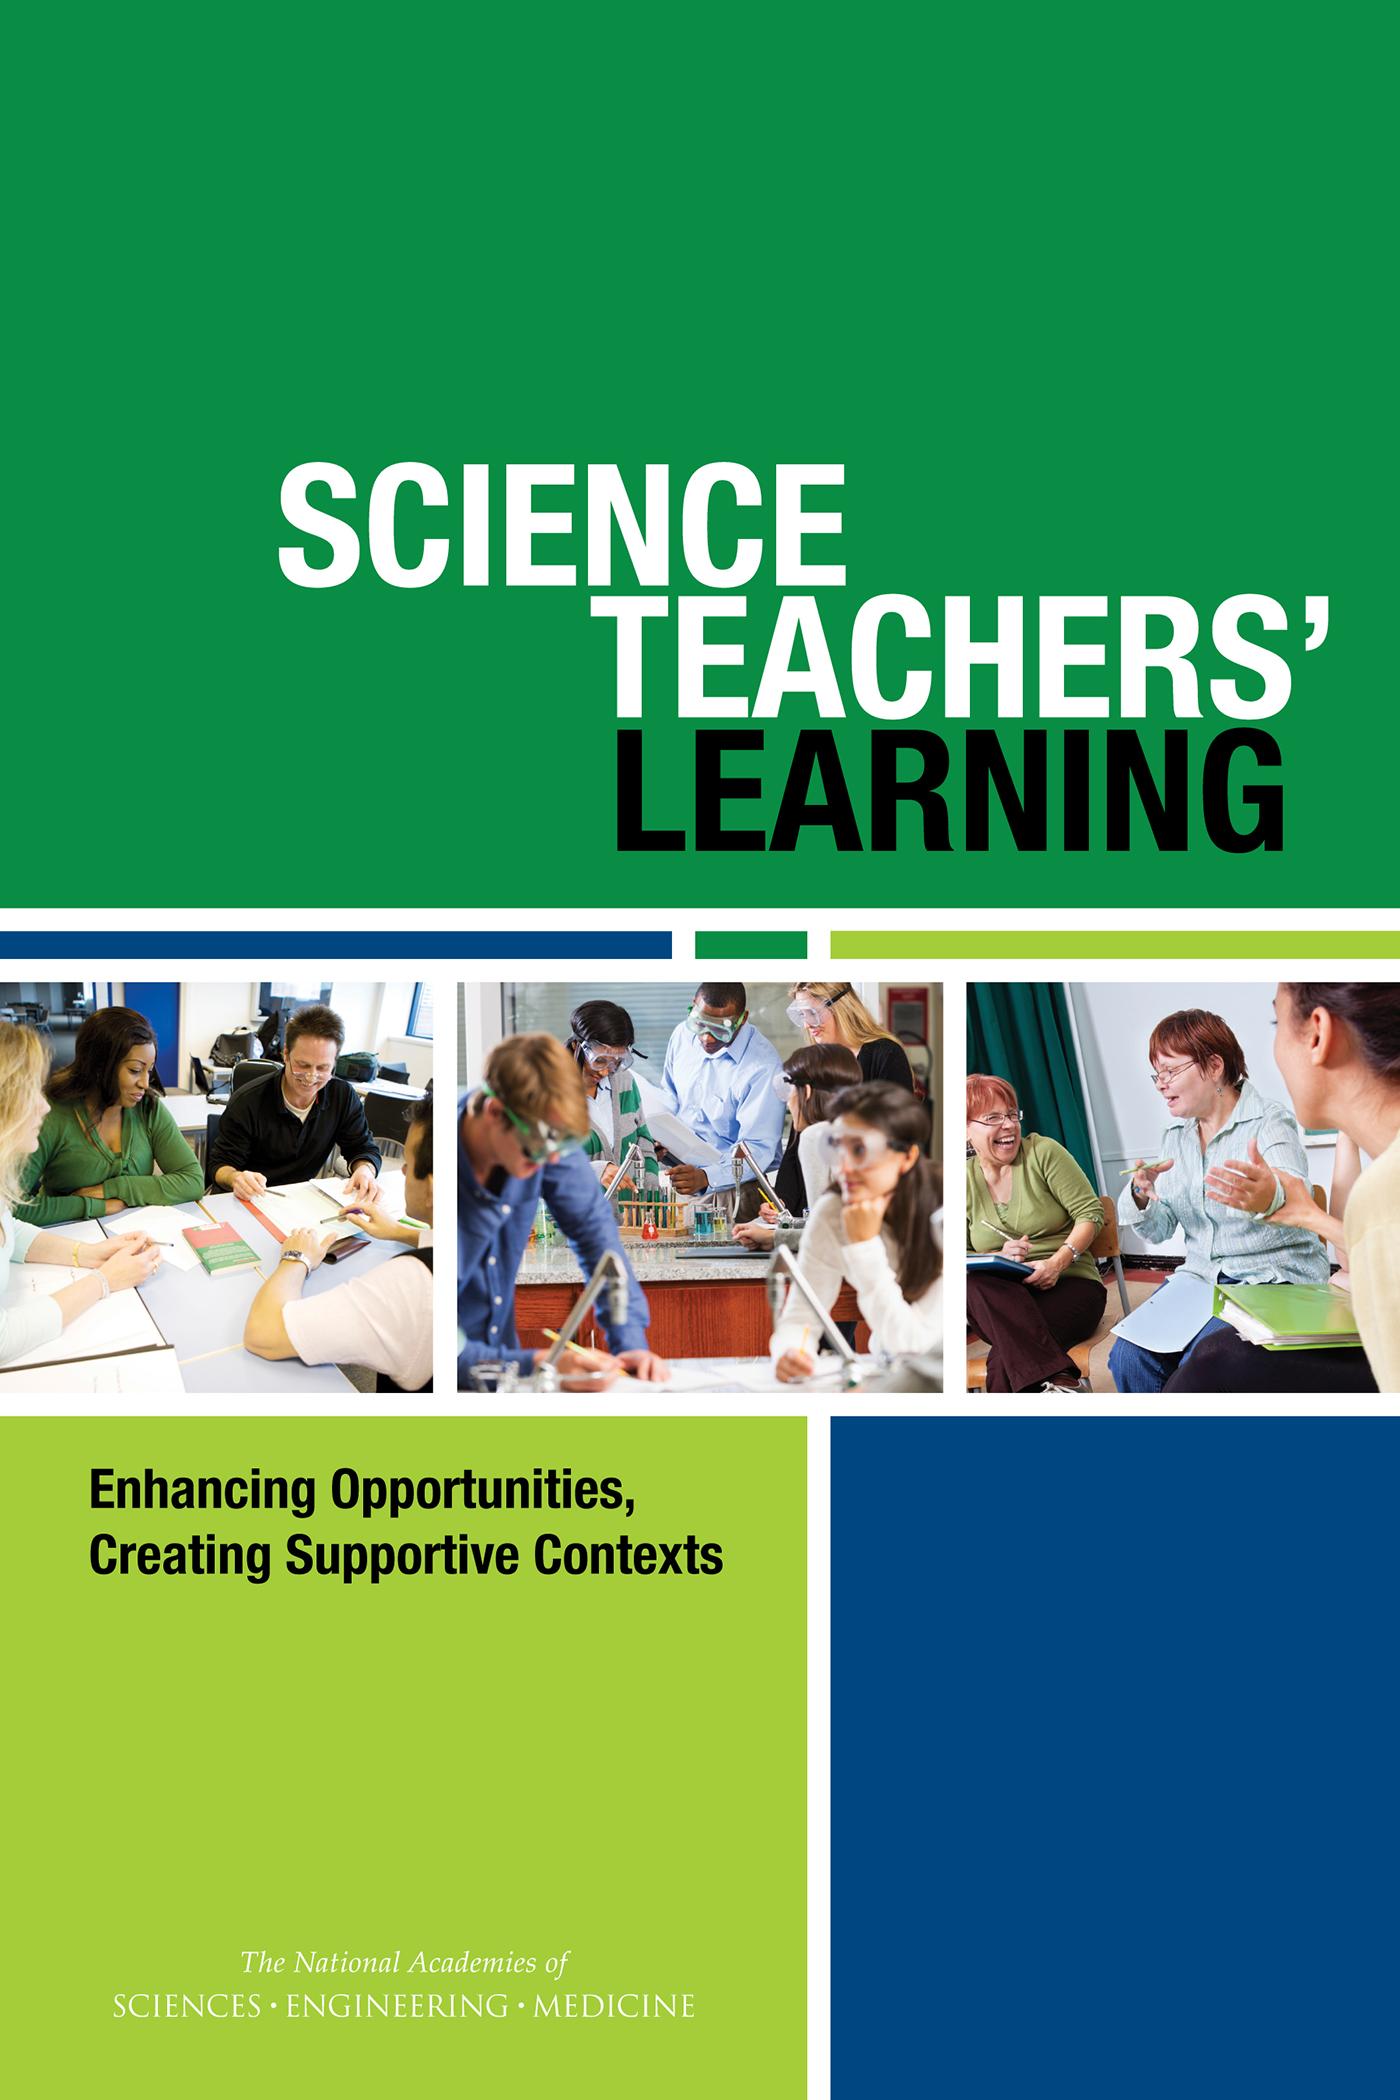 Uga Professor Contributes To New Science Education